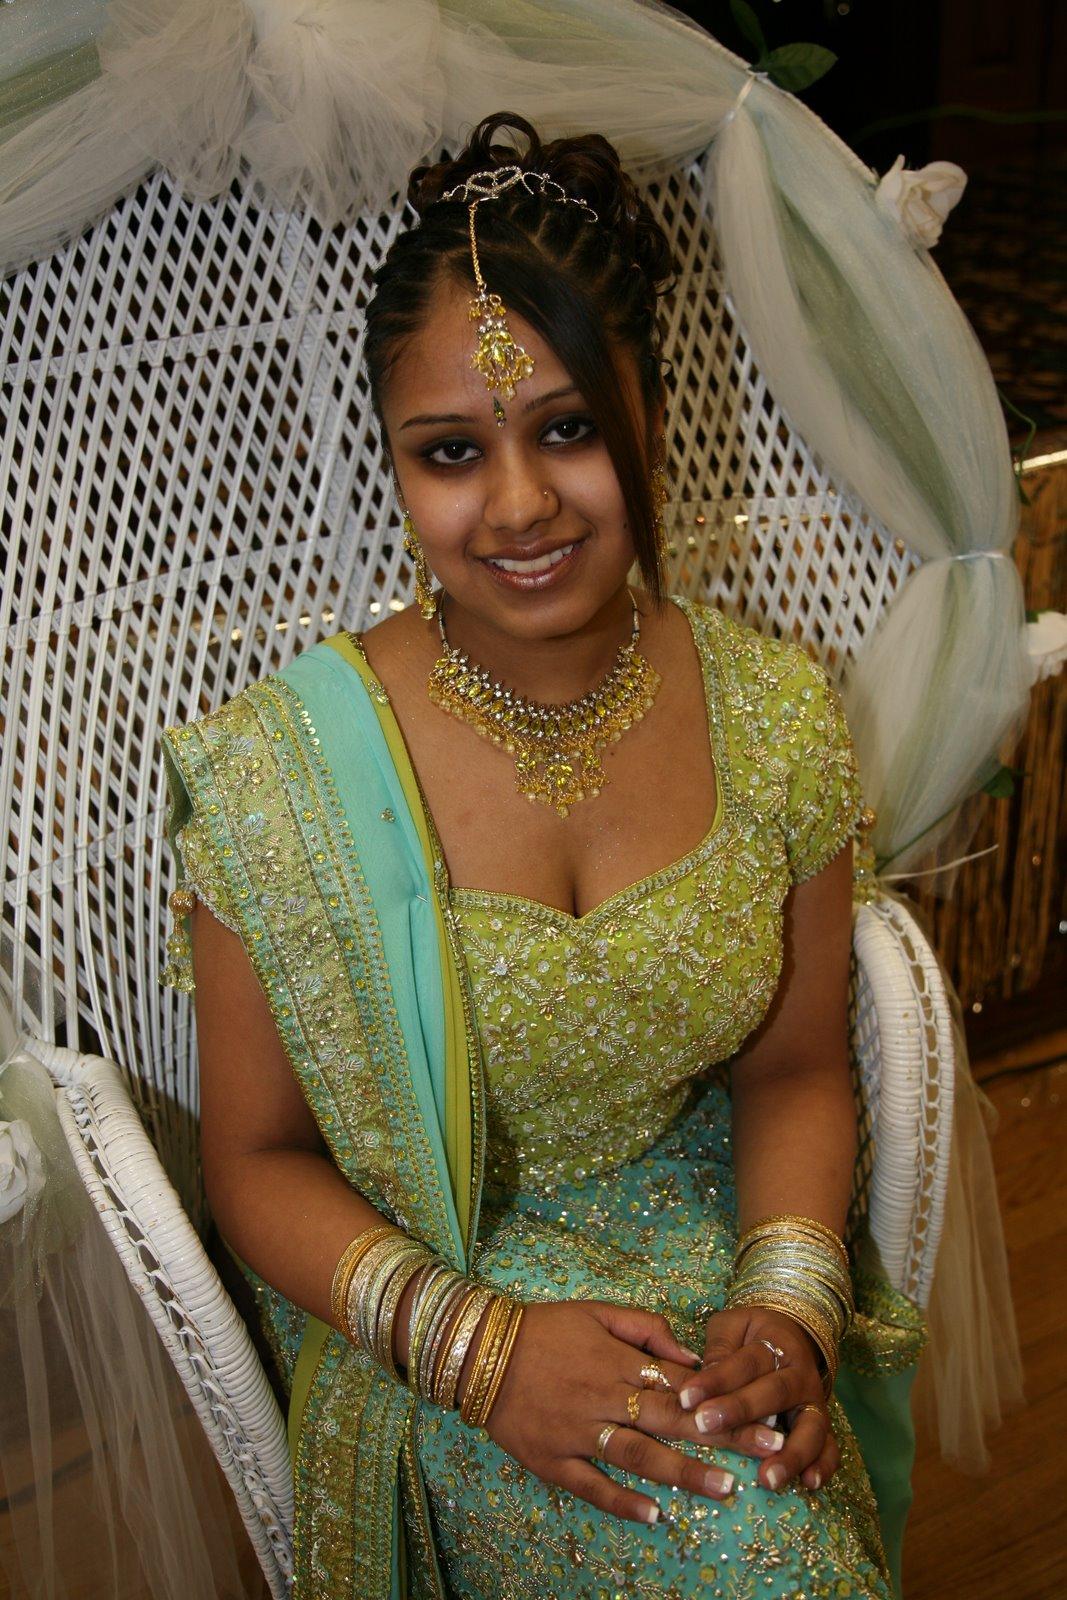 Enjoy Indian Real Life...: indian girl in shadi lacha down blouse